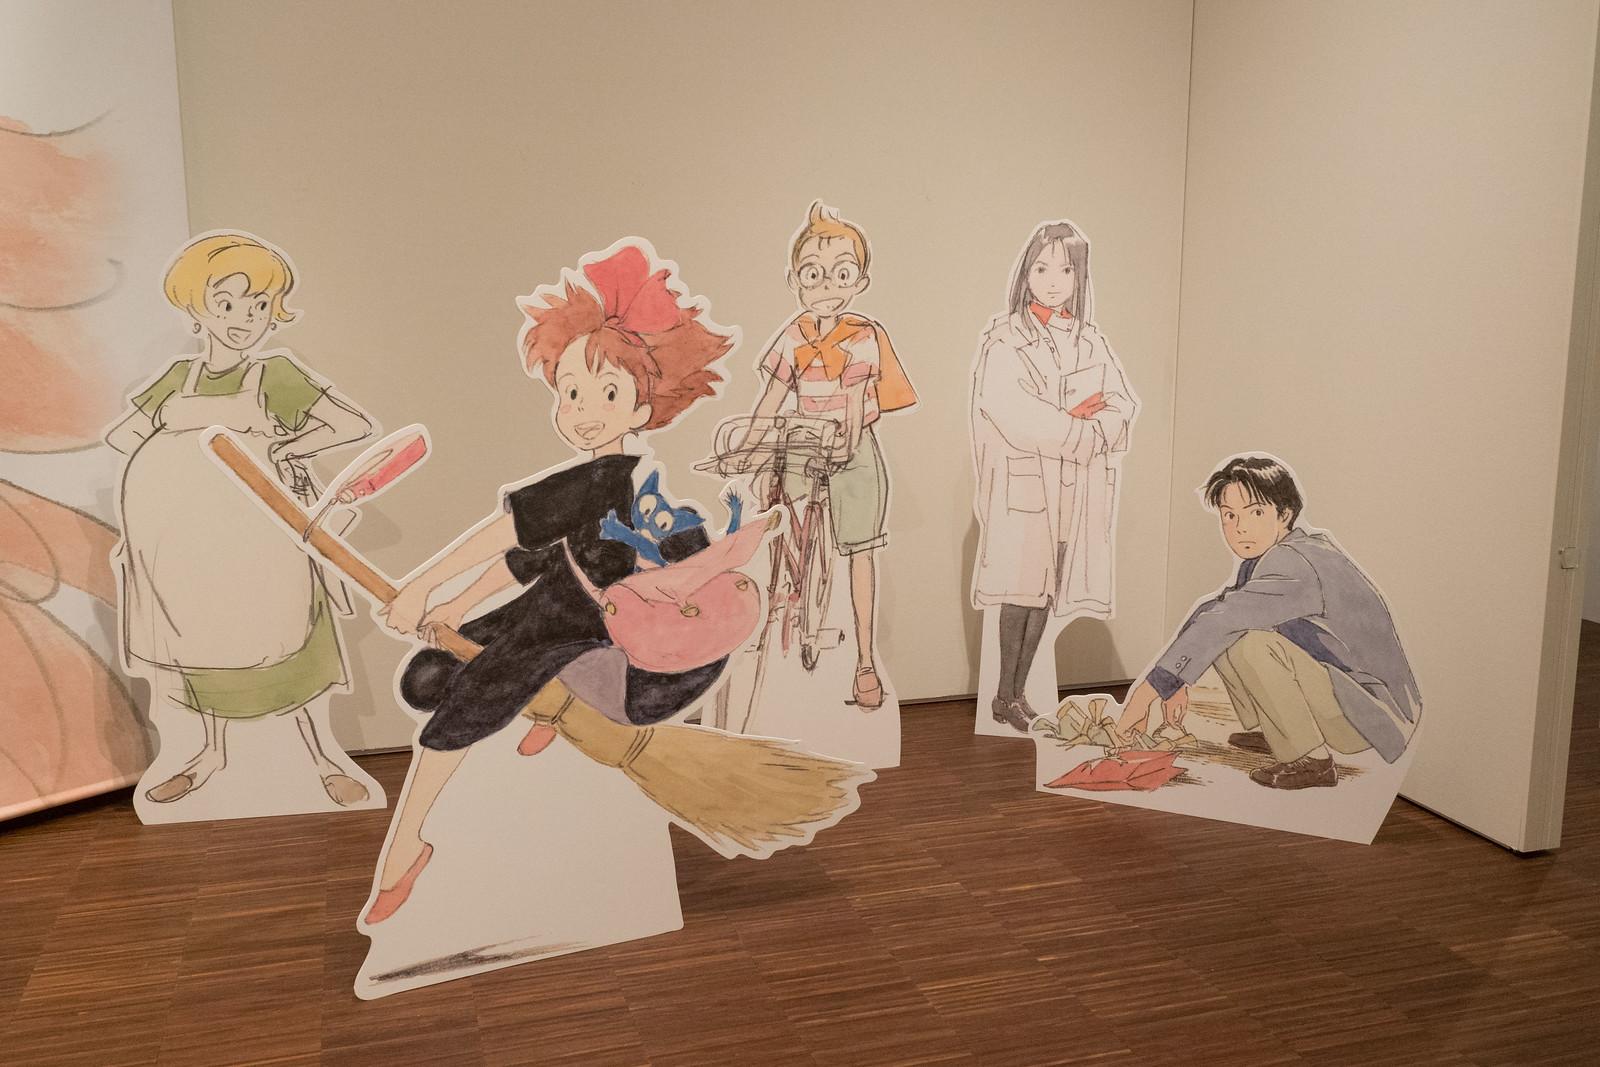 Ghibli_katsuyakondo-22